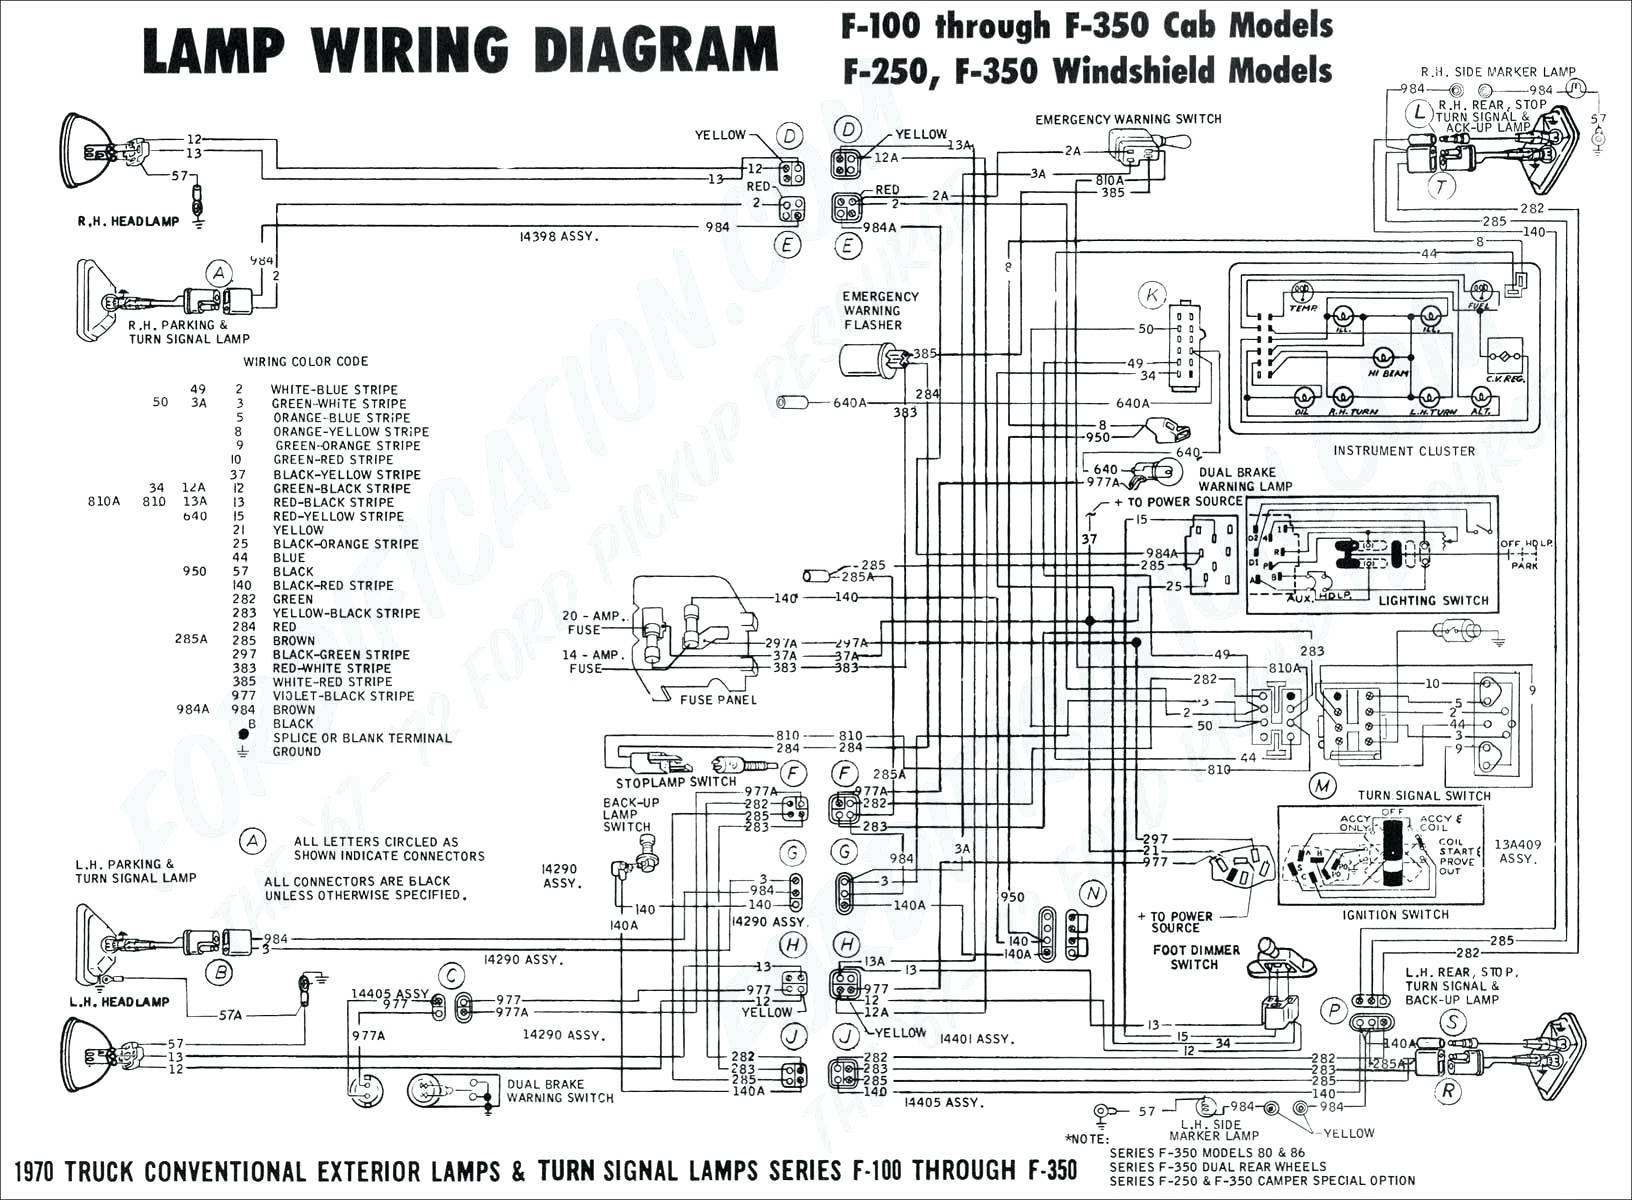 Chevrolet 350 Engine Diagram Wiring Diagram Power Ram 350 1991 Schematics Wiring Diagrams • Of Chevrolet 350 Engine Diagram